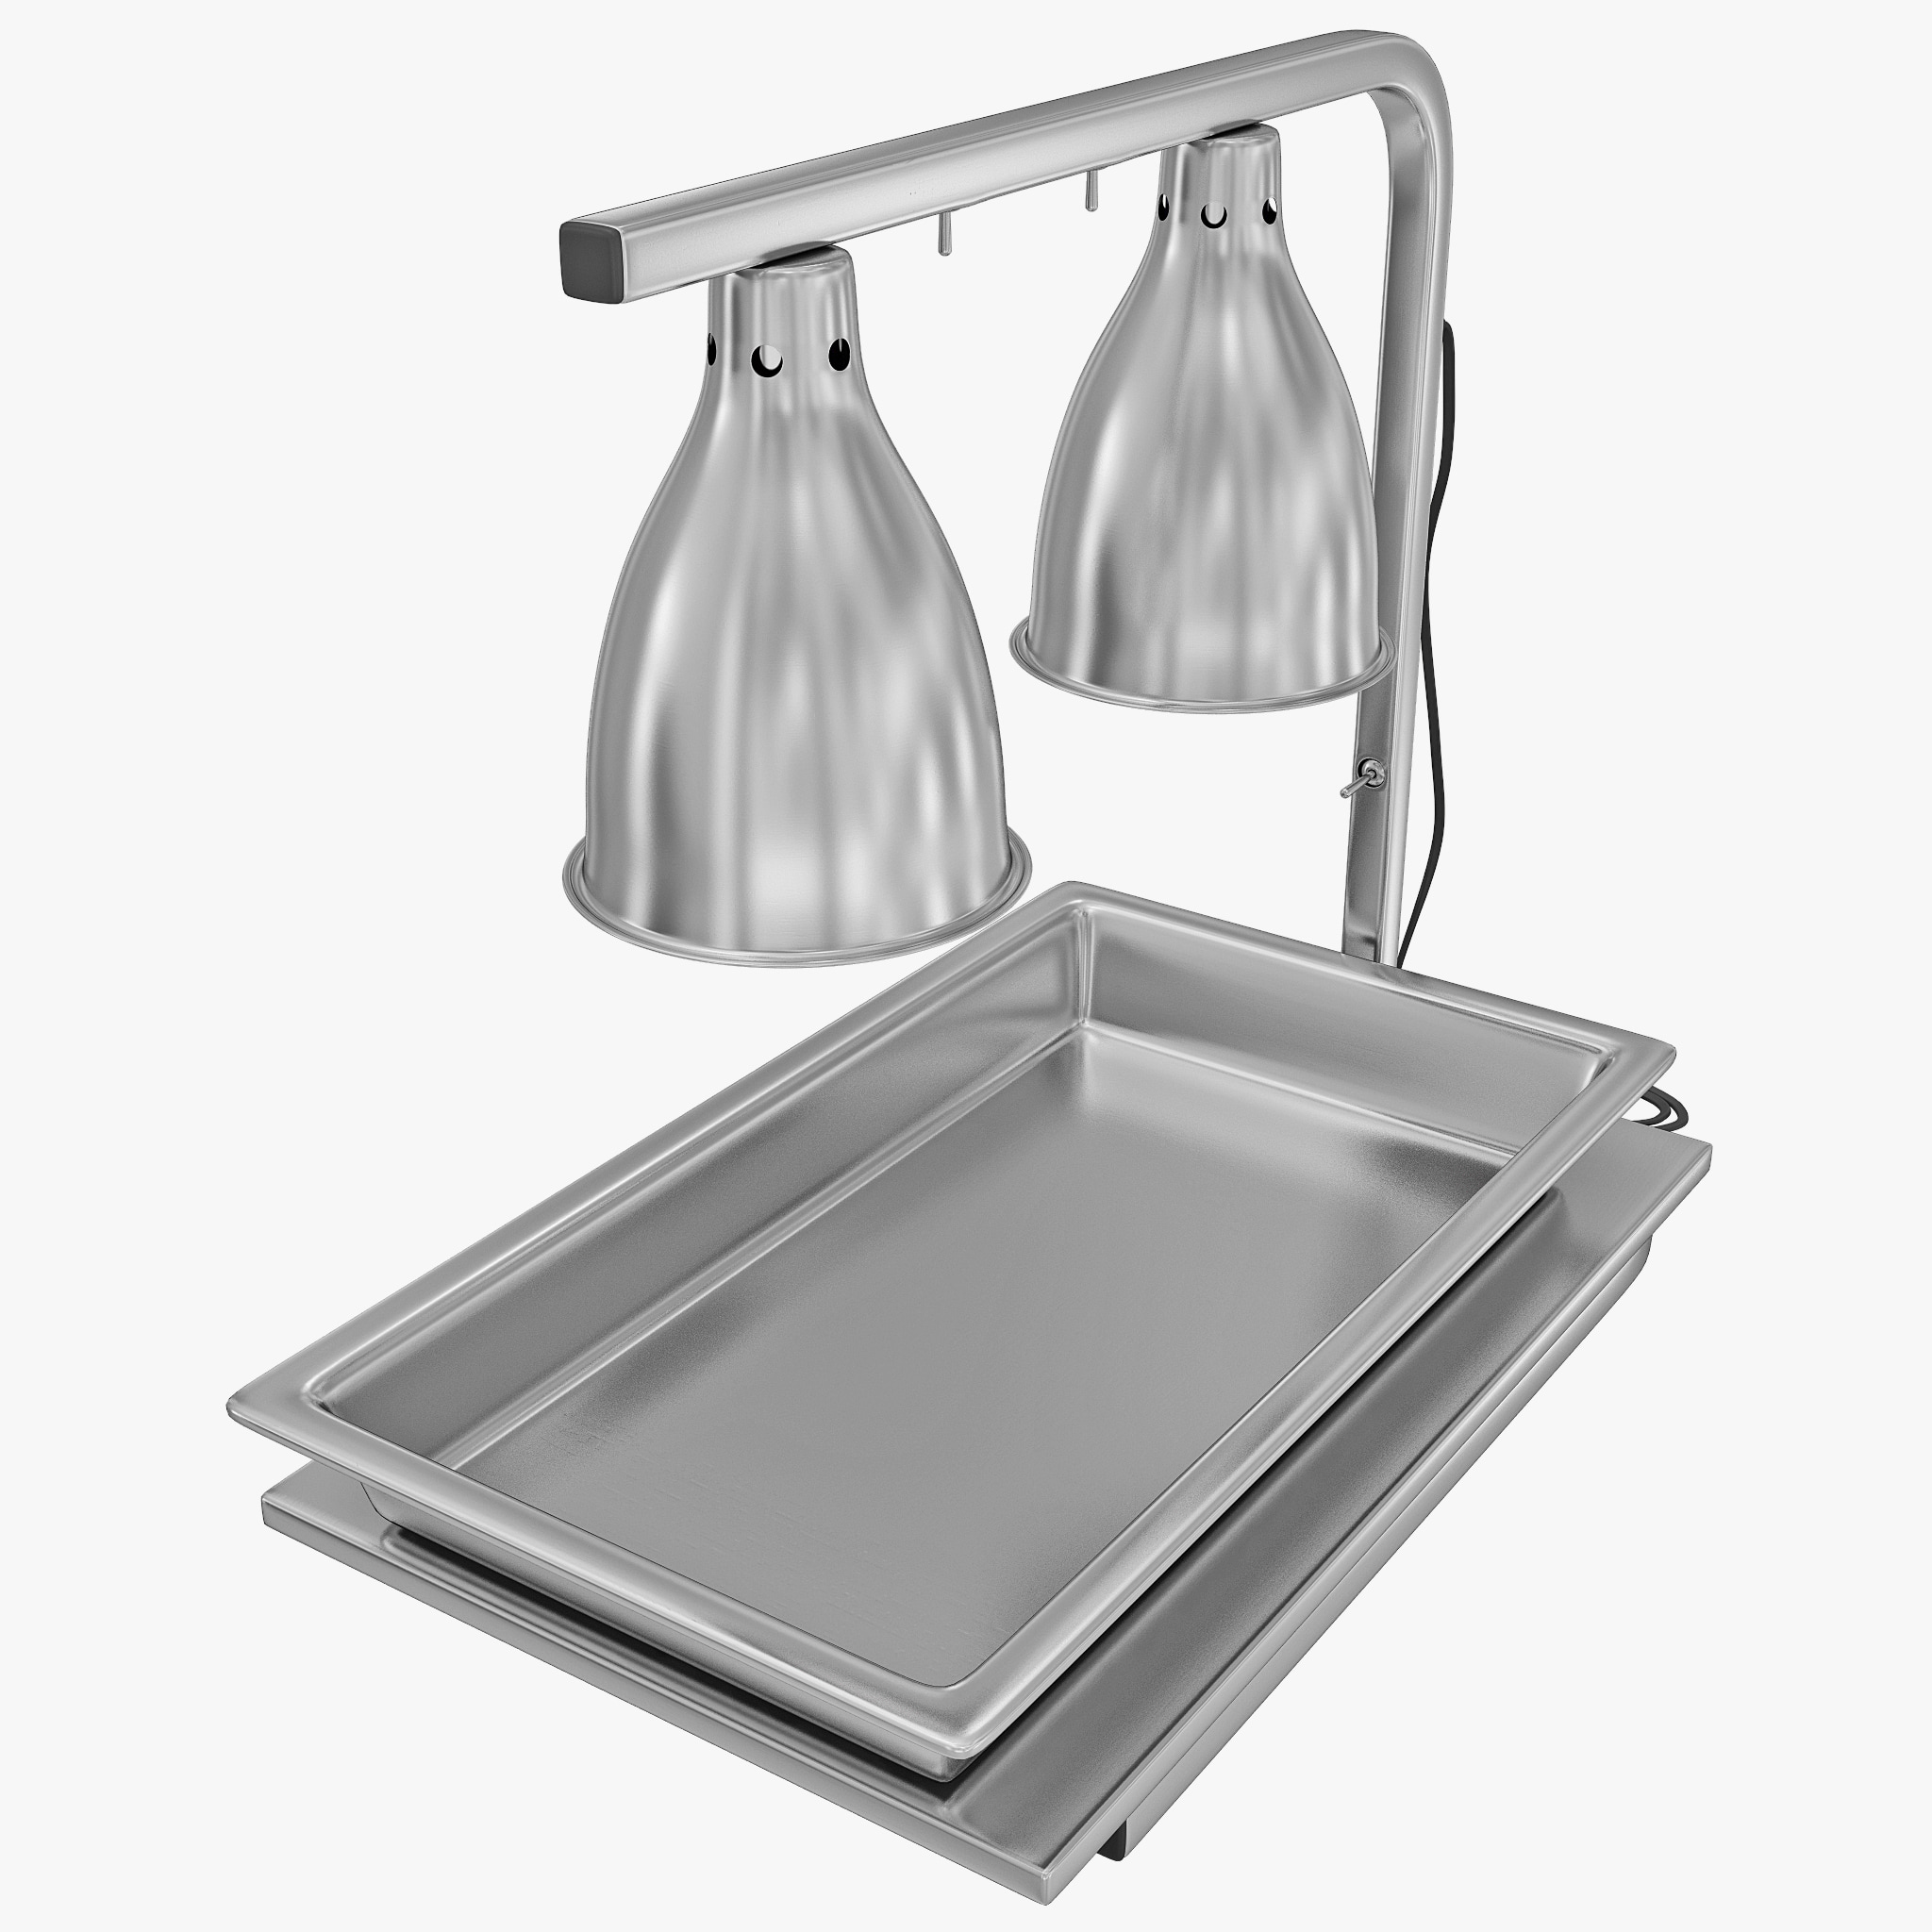 264030 food heat lamp. Black Bedroom Furniture Sets. Home Design Ideas